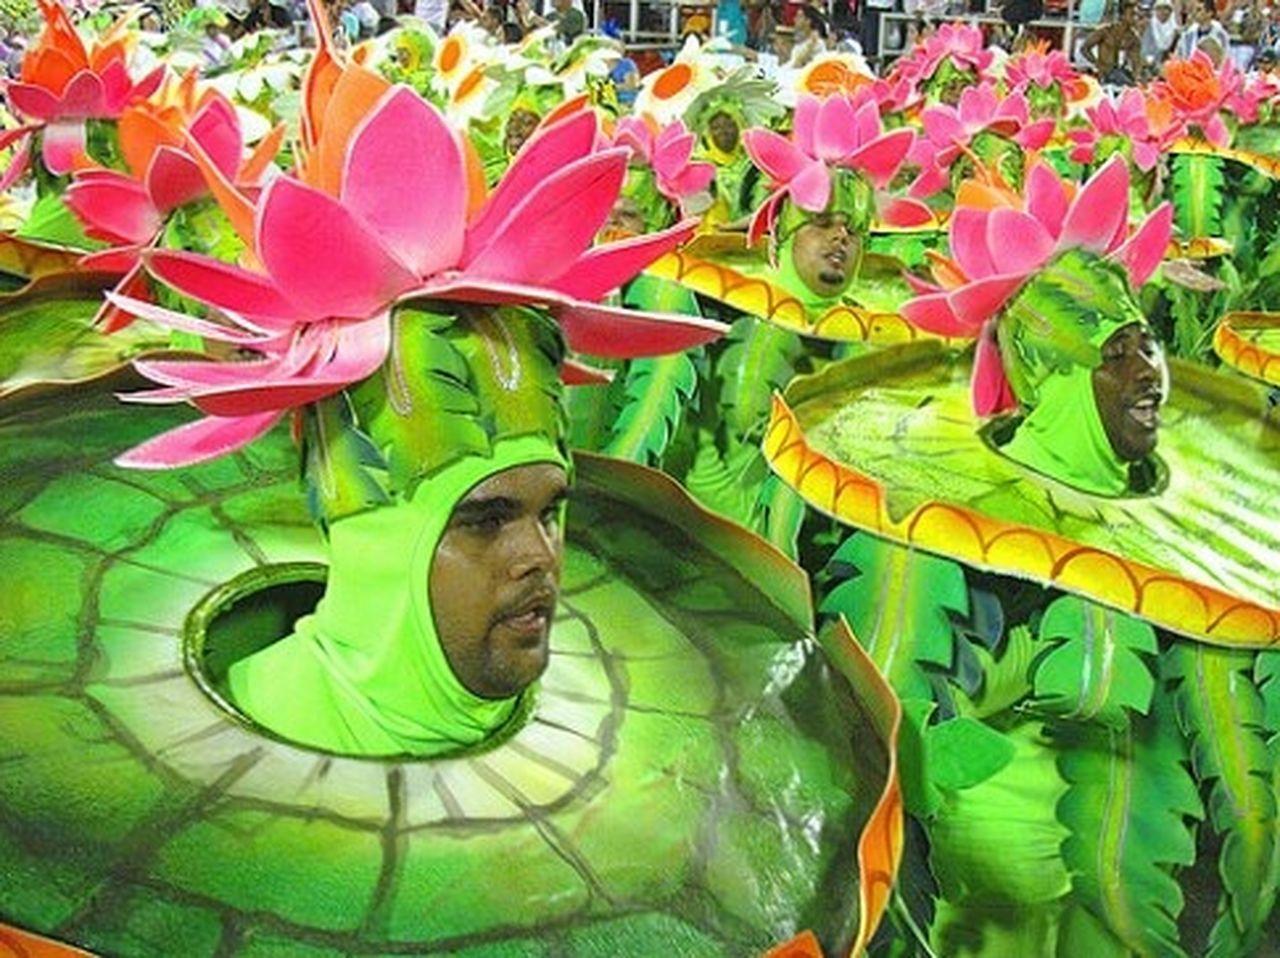 Colors Of Carnival Olimpic Games  Carioca Brasil ♥ Selusava Carnival Carnaval Colours Of Carnival Cariocadagema Brasil Brazil Carioca Girl Riodejaneiro Rio De Janeiro Brazil ❤ Taking Photos Olympicgames Enjoying Life